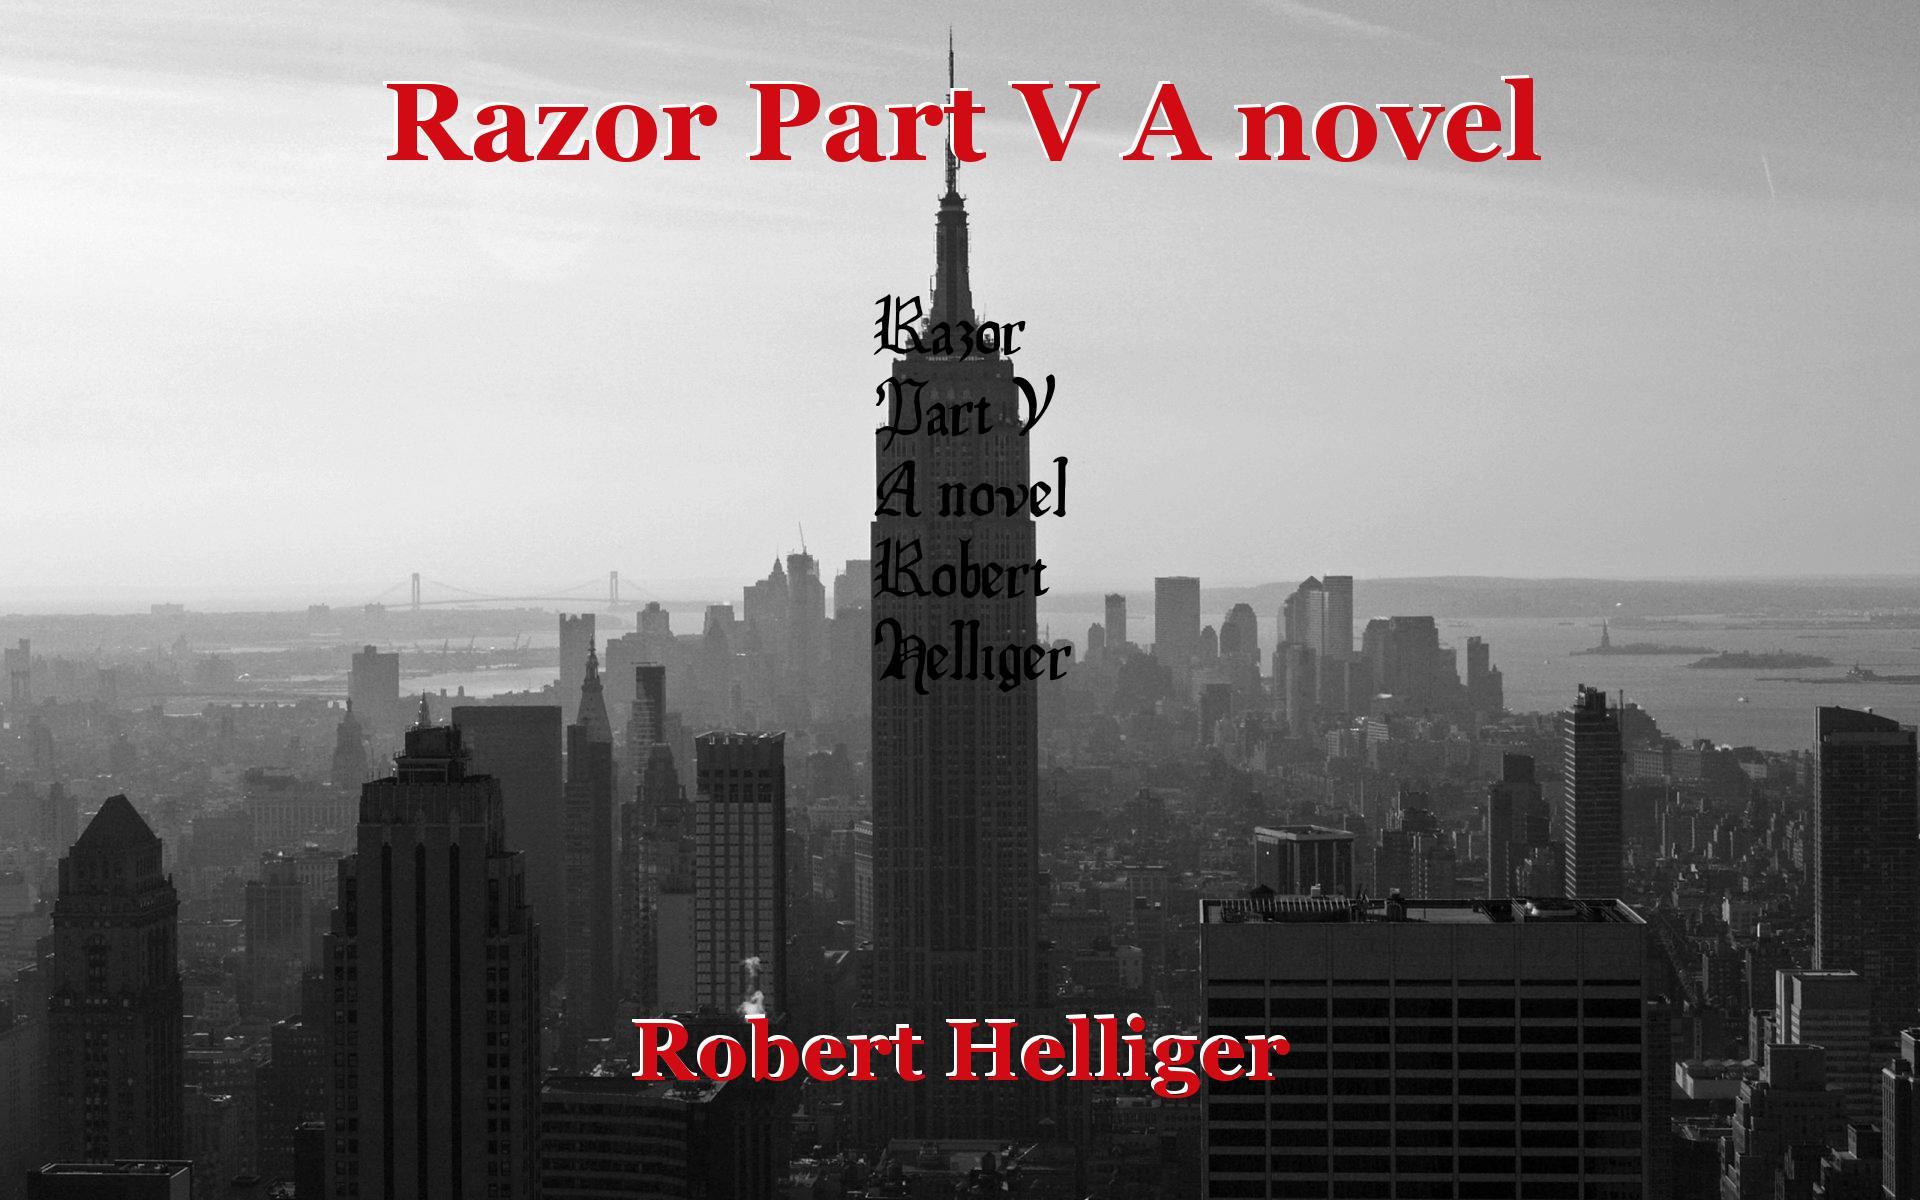 Razor Part V A novel: Chapter 1, book by Robert Helliger